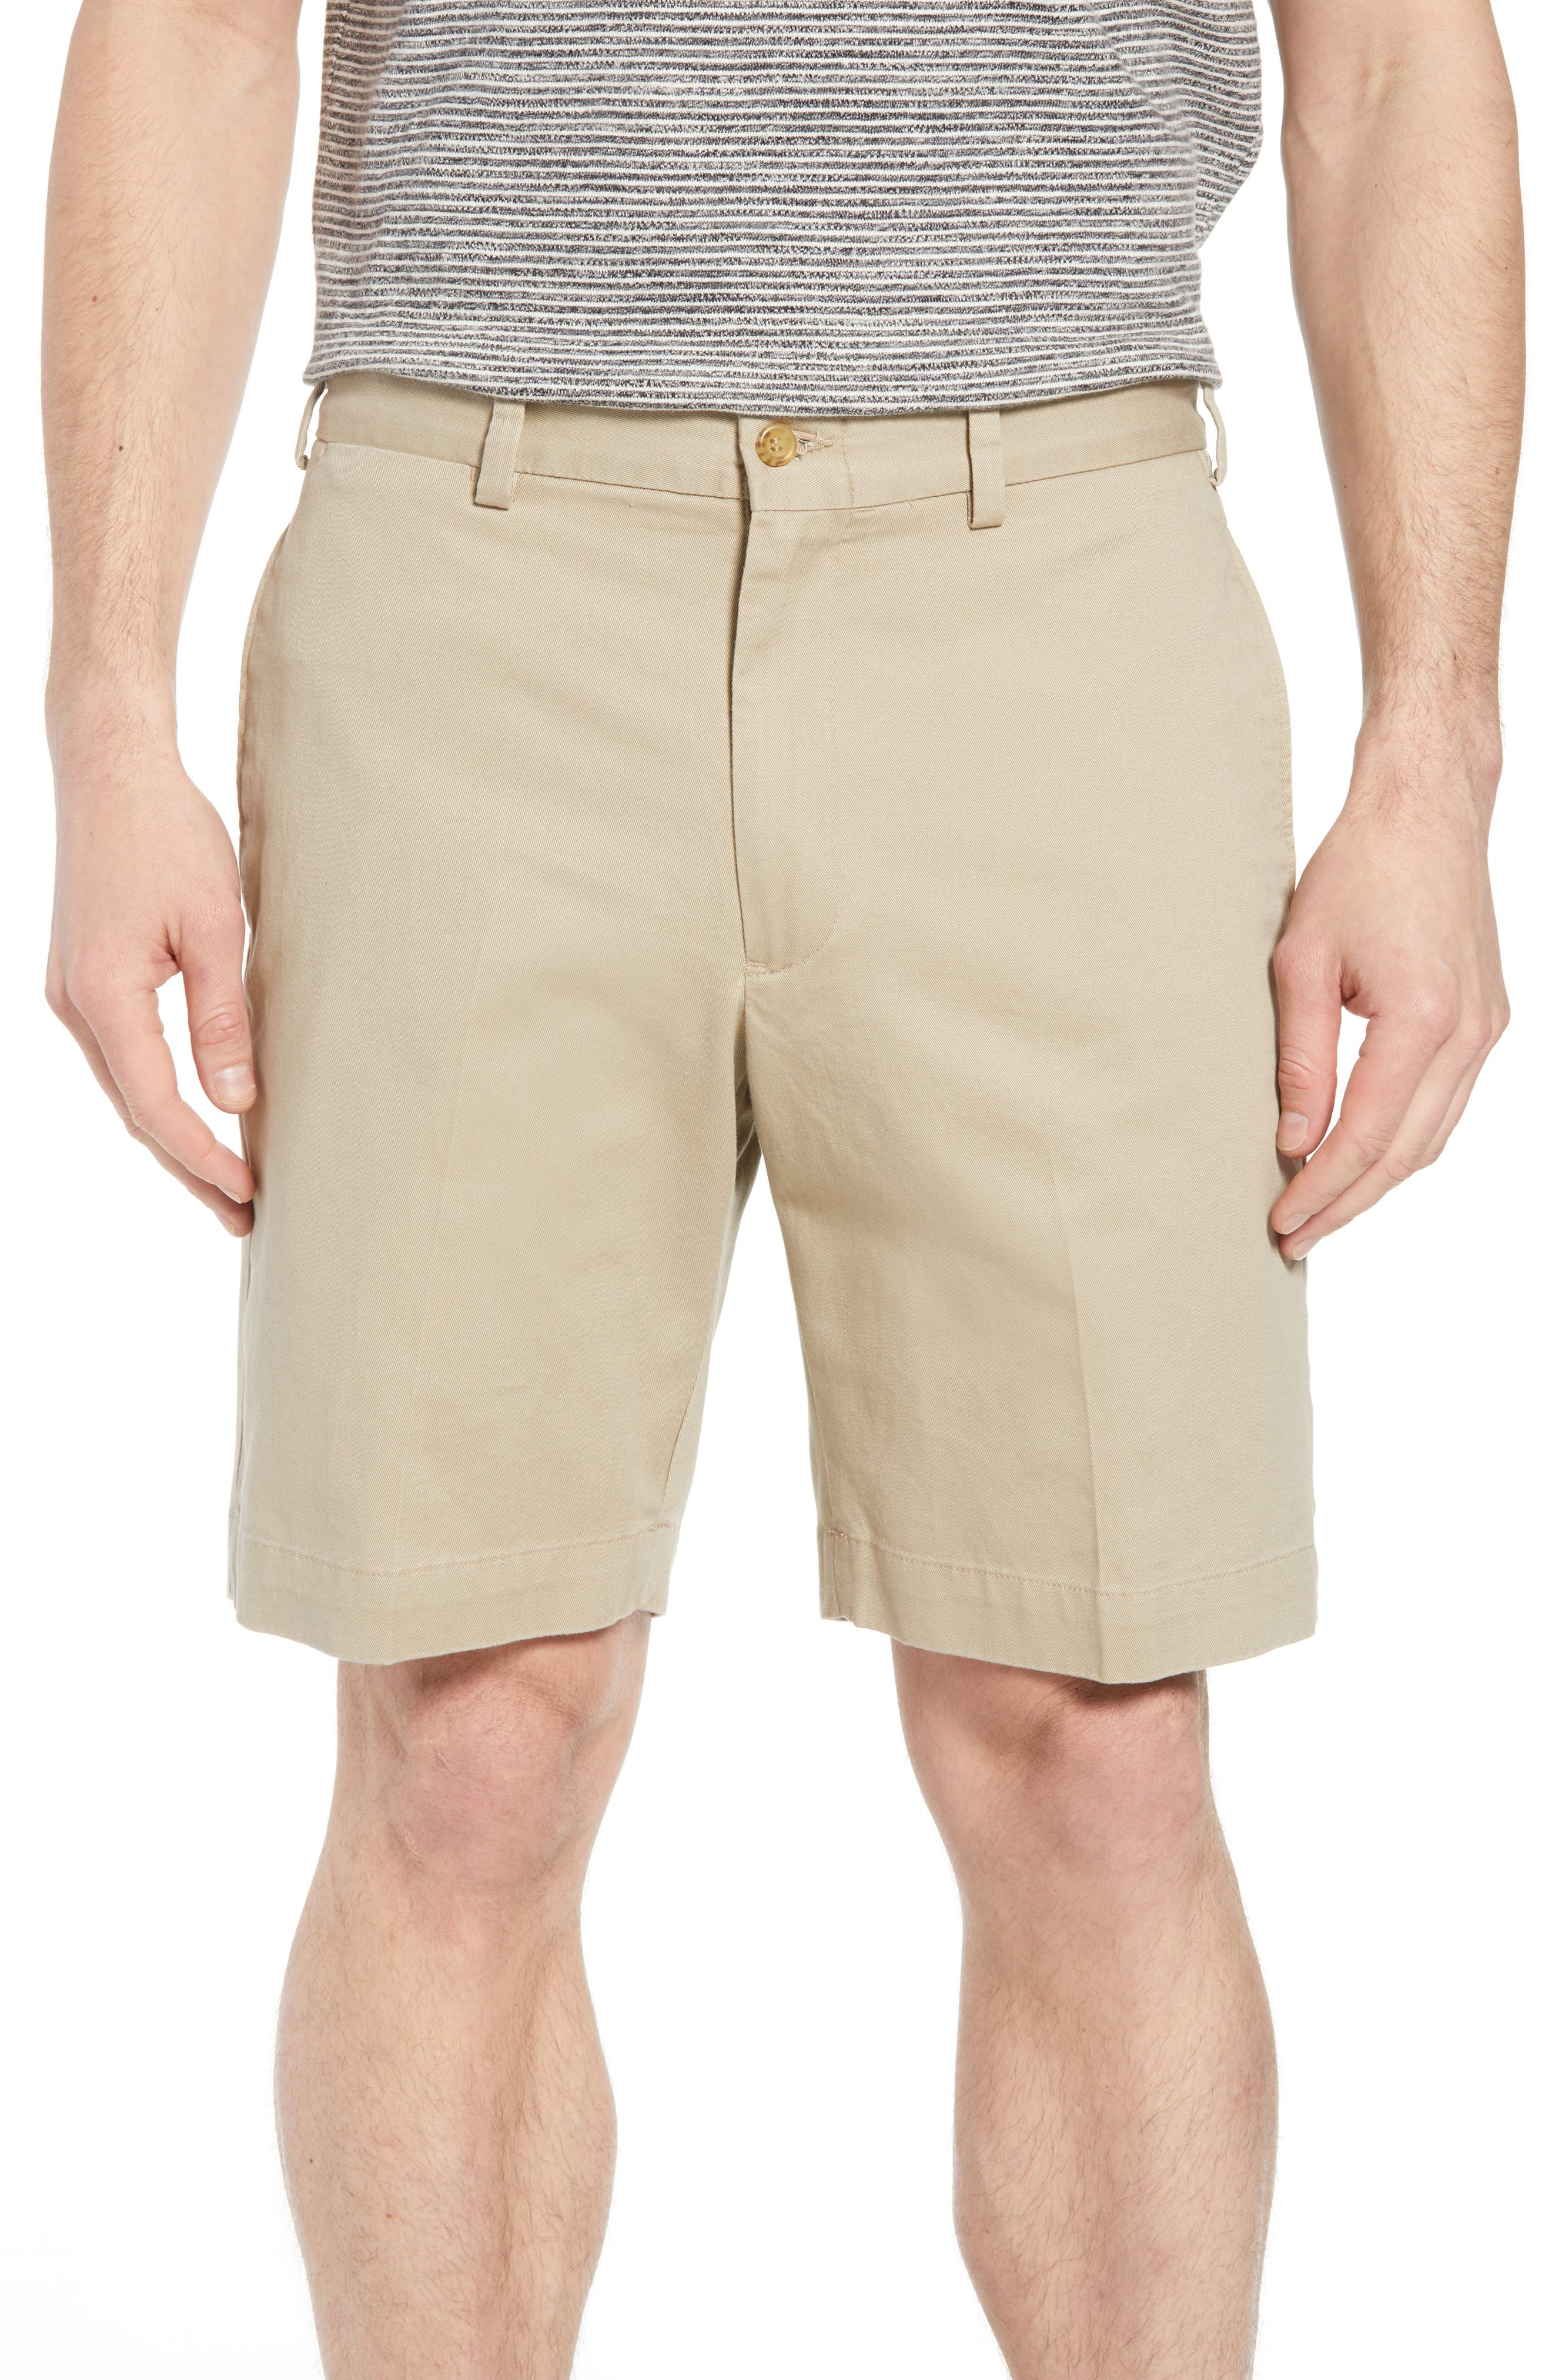 M2 Classic Fit Vintage Twill Flat Front Shorts,                             Main thumbnail 1, color,                             KHAKI